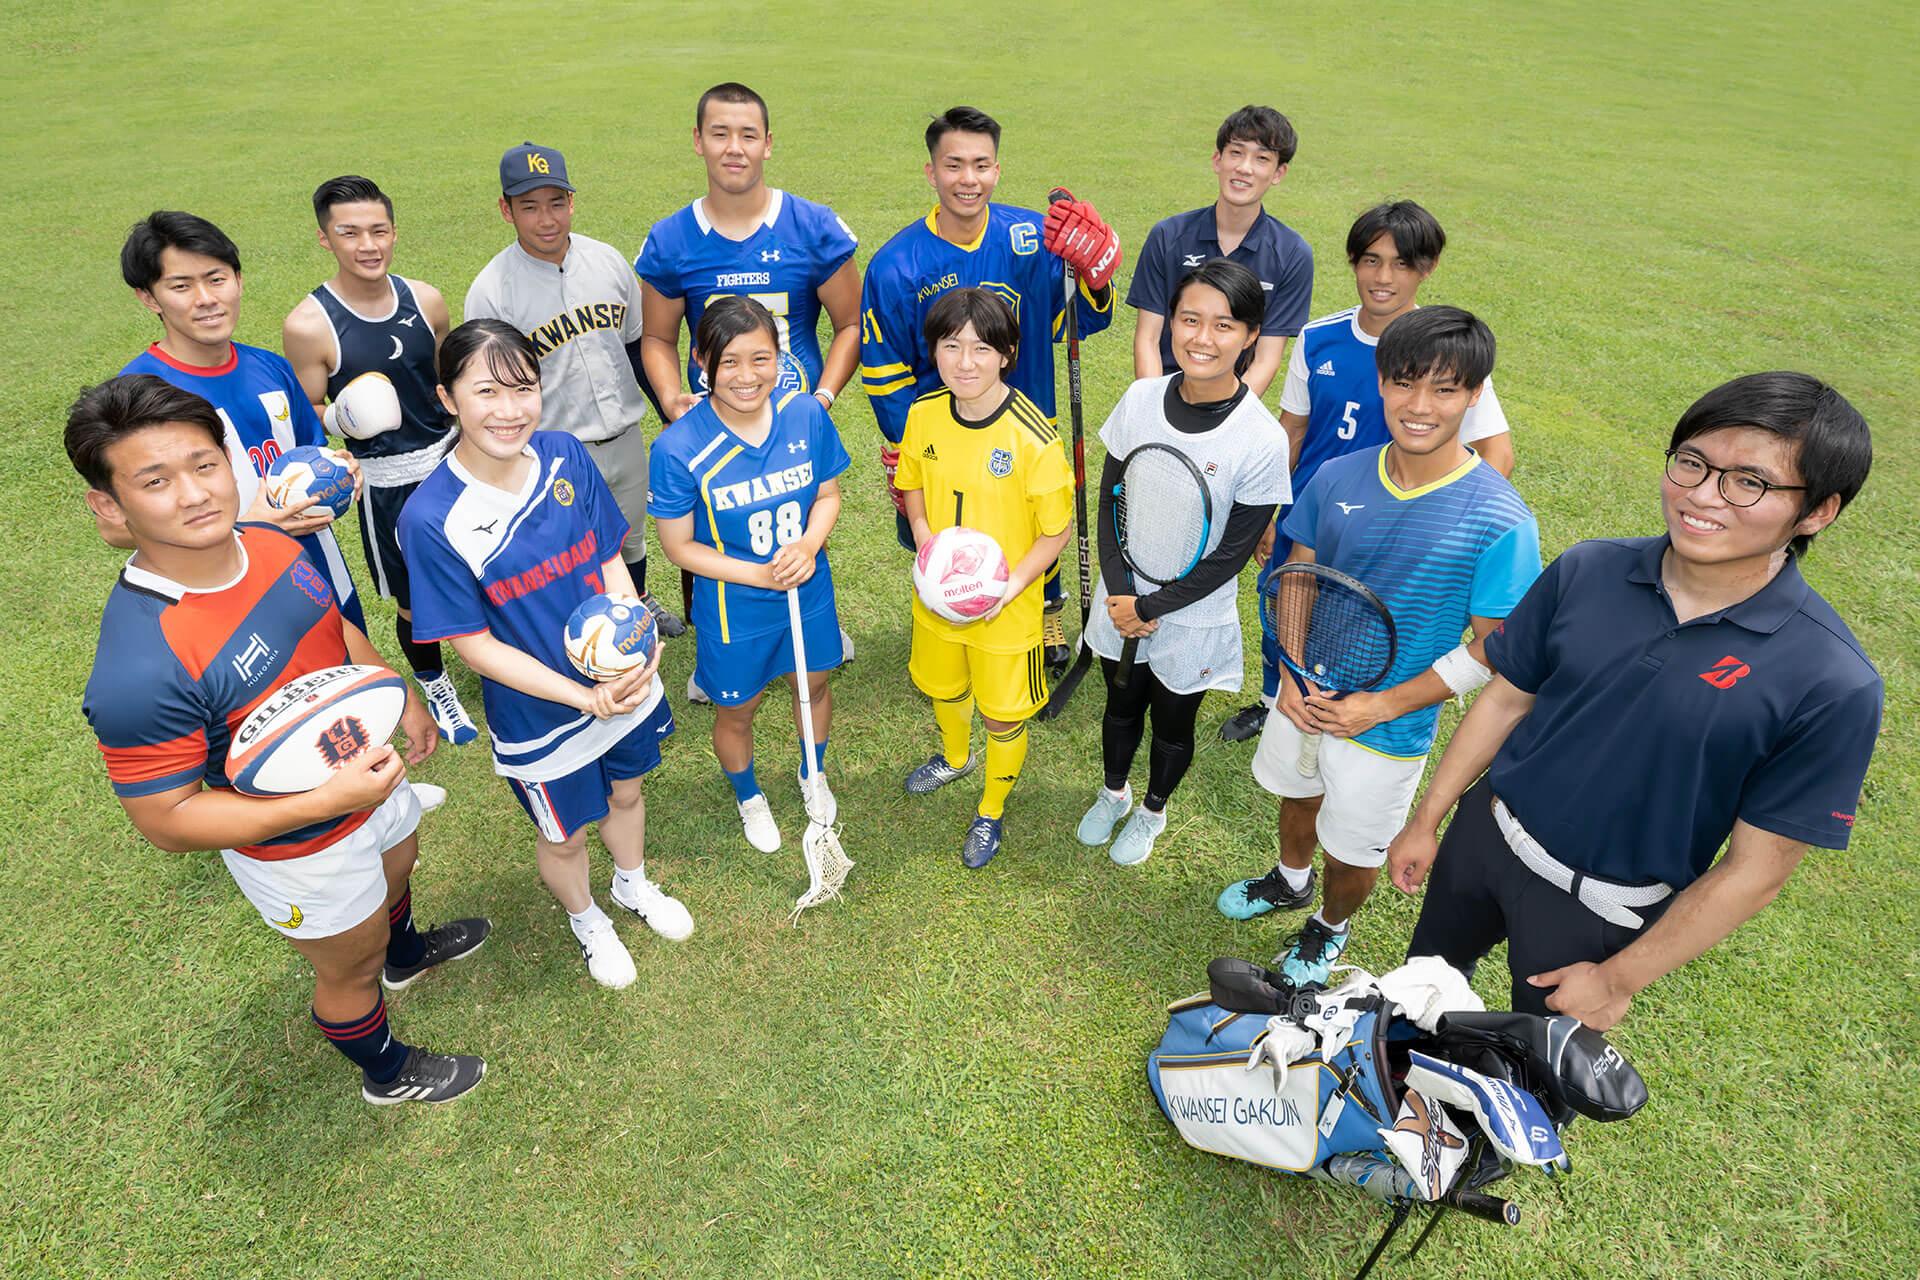 KGADが目指す学生スポーツの未来像